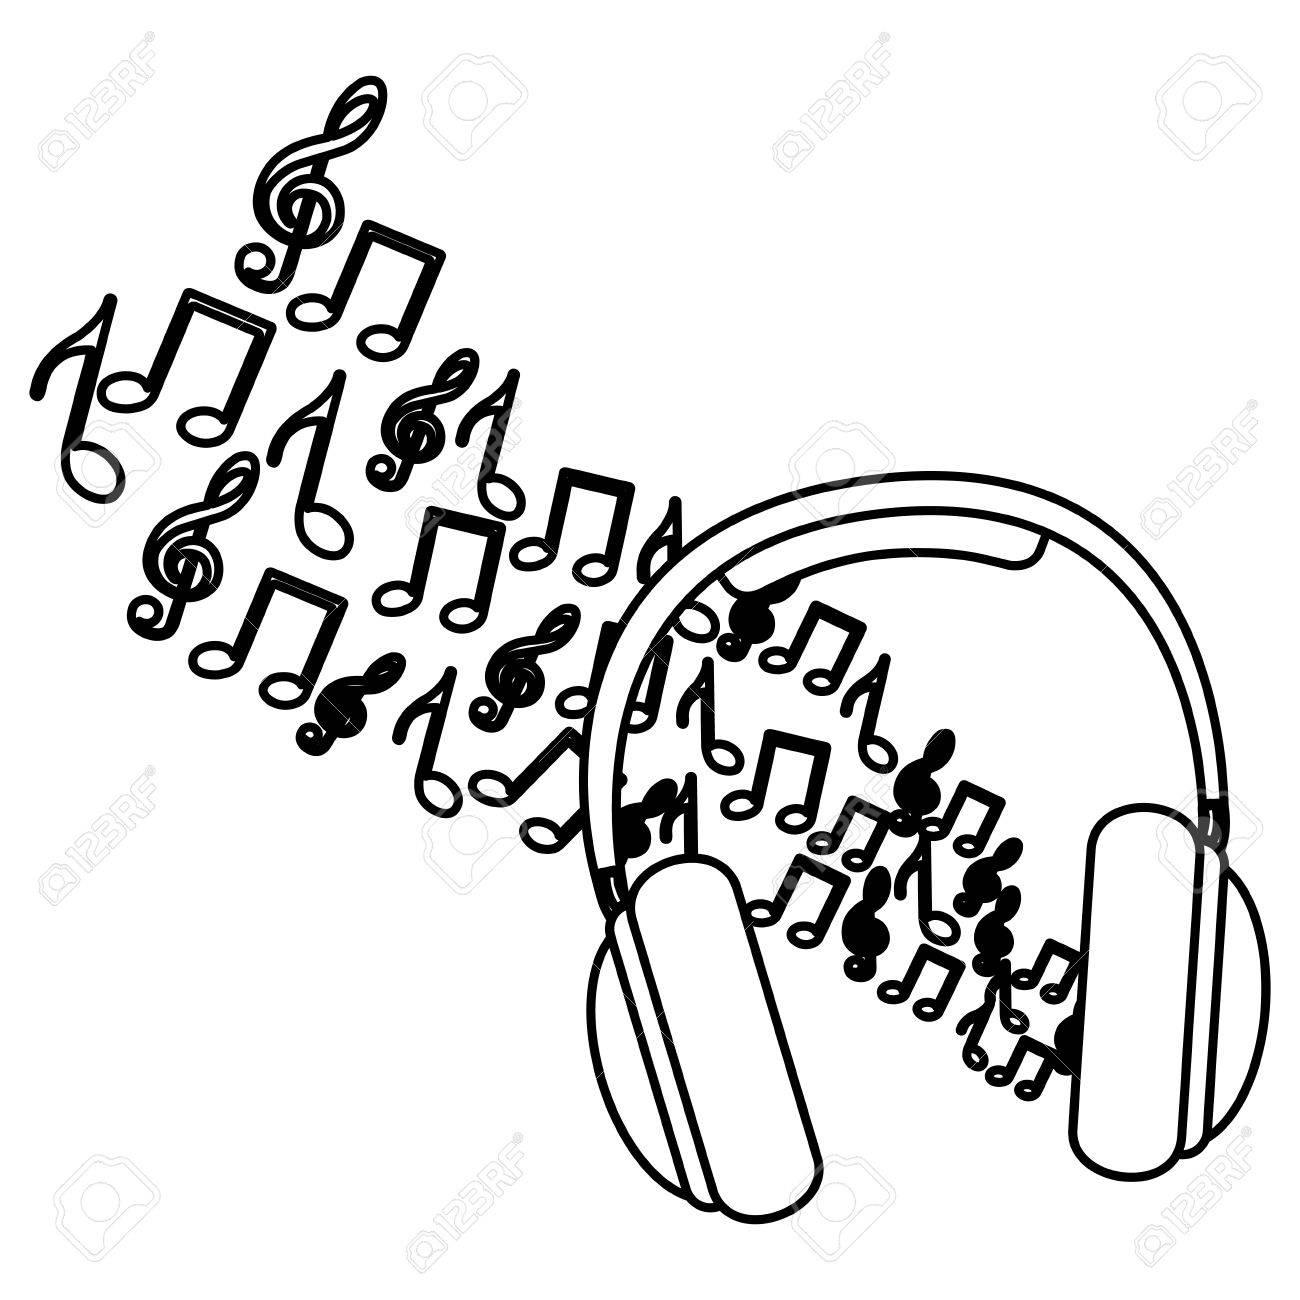 Auriculares Silueta Con Ilustración De Vector De Notas Musicales